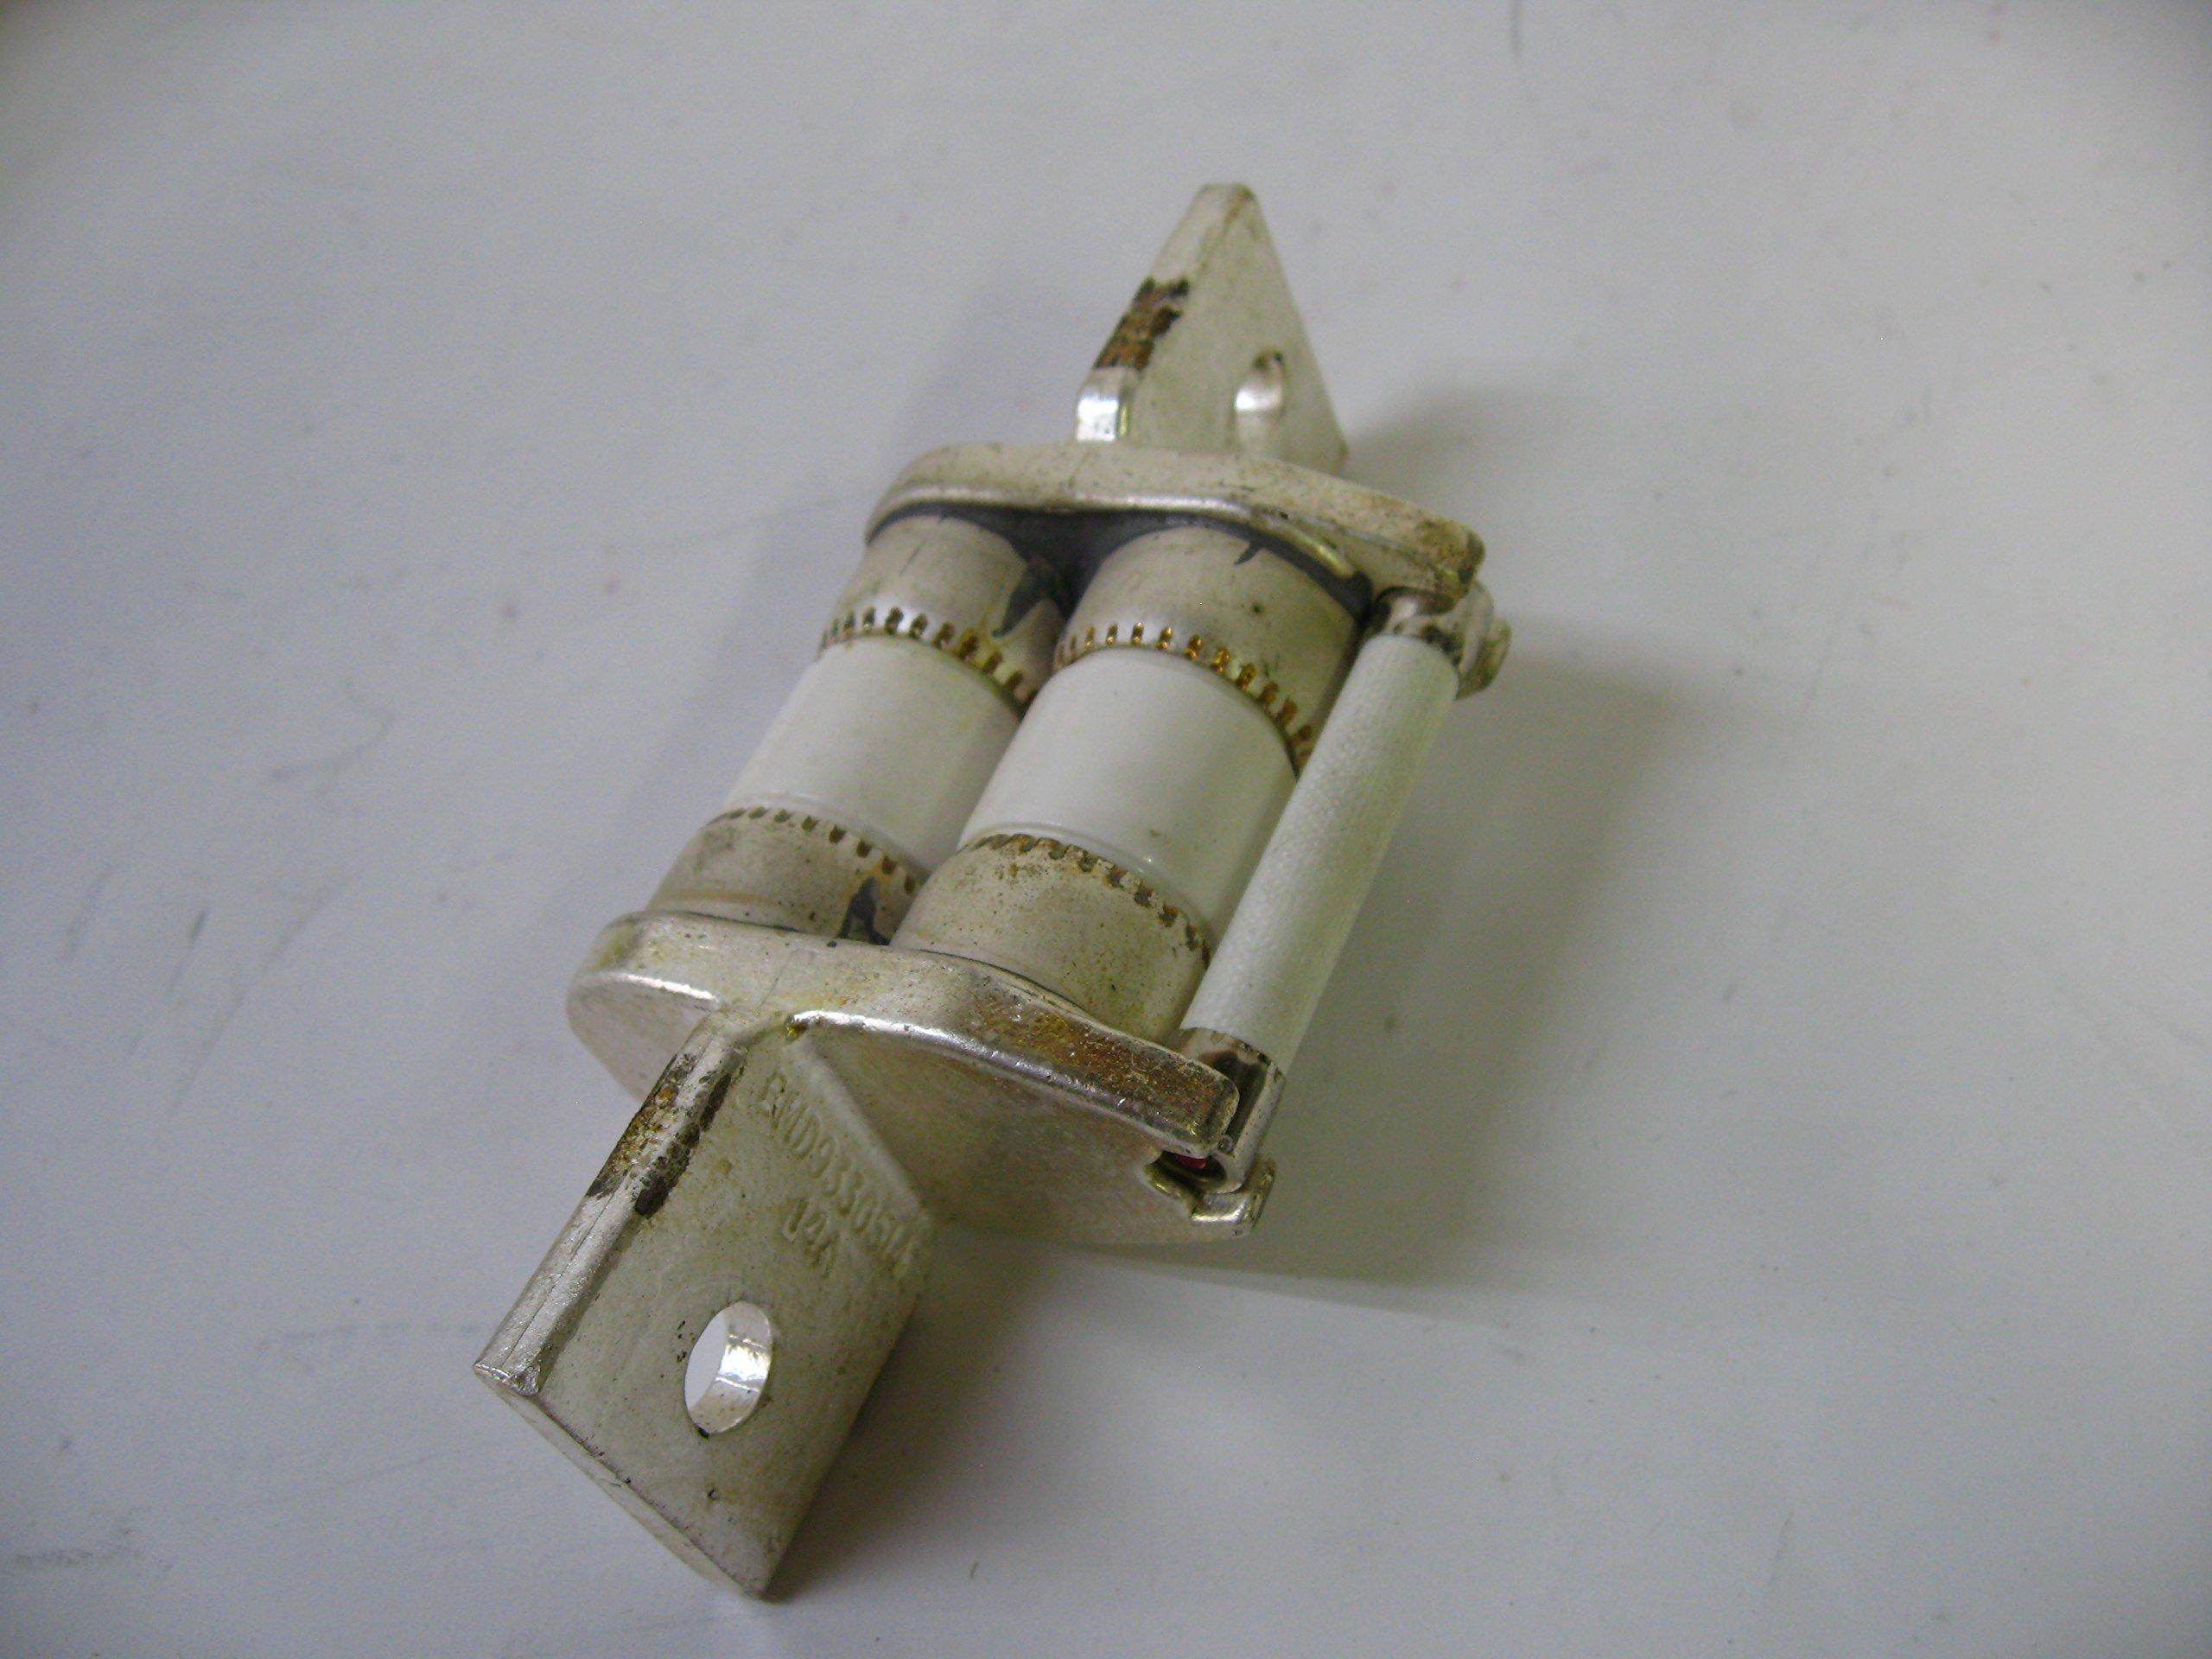 Cooper Bussmann B9330514 semiconductor fuse